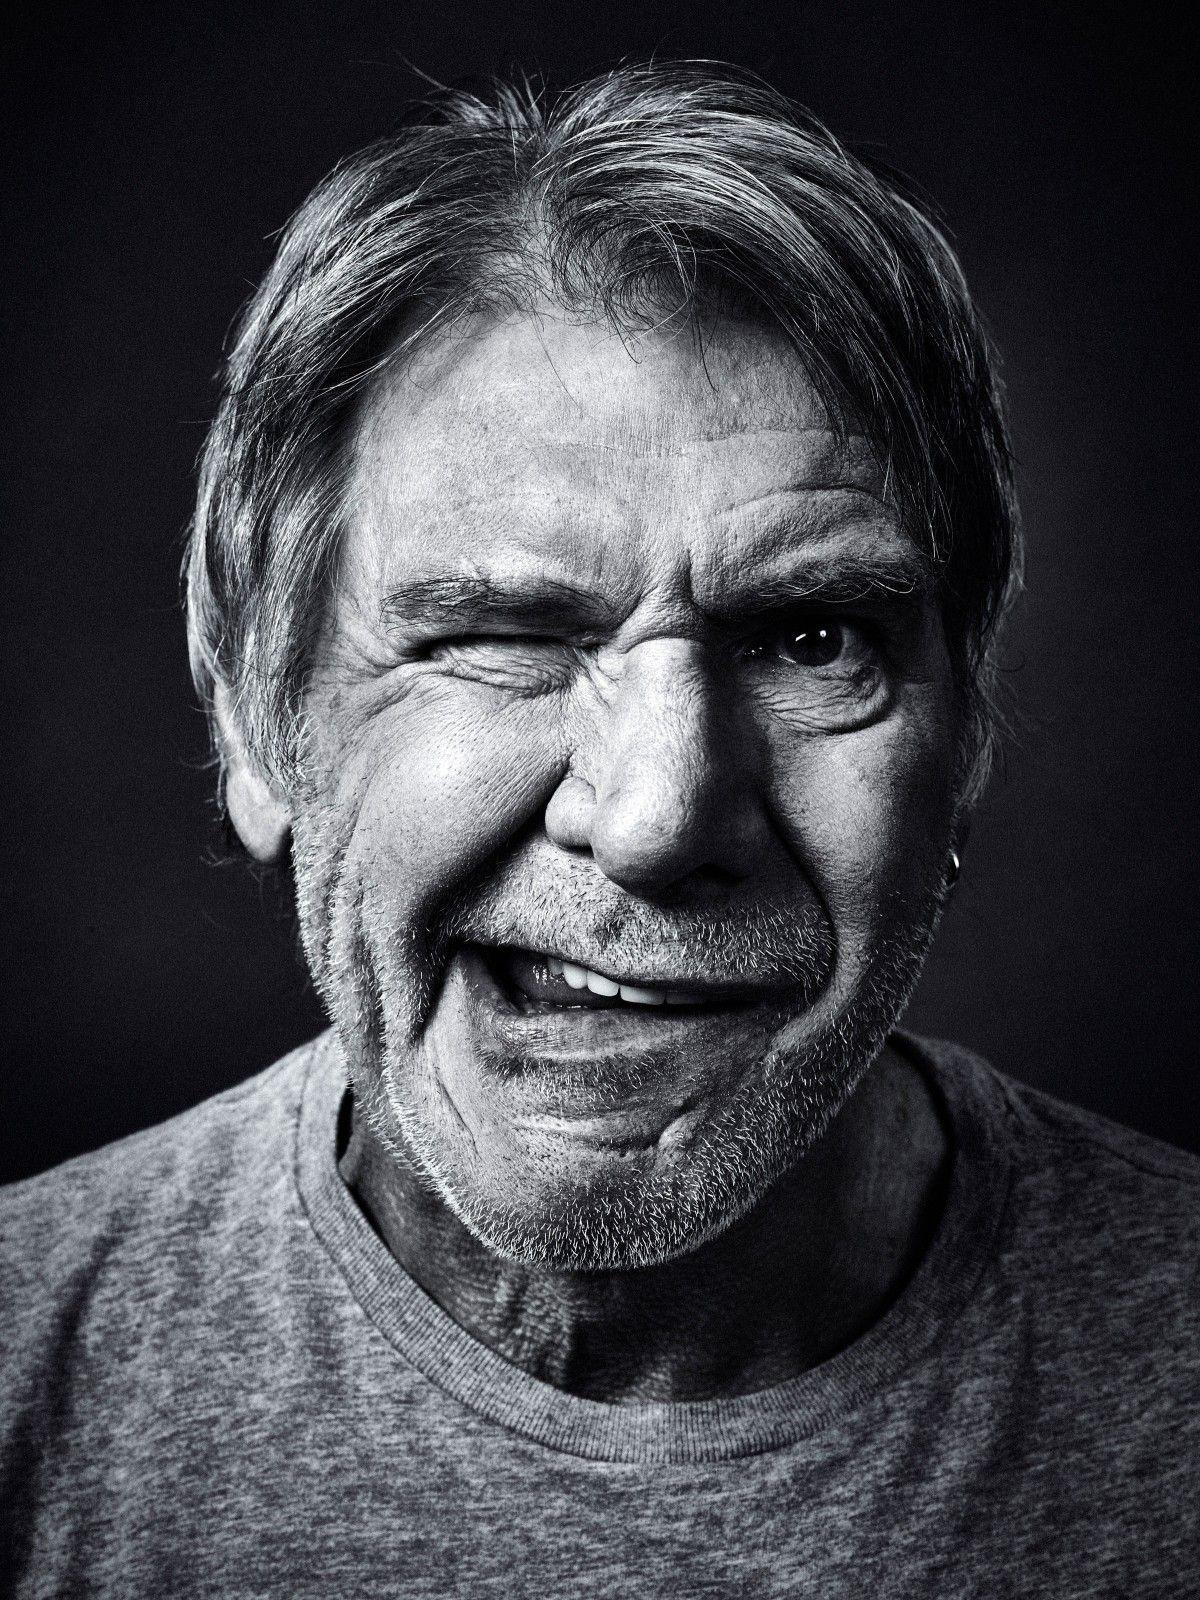 Pin By Nikolay Yordanov On Photox Celebrity Portraits Actors